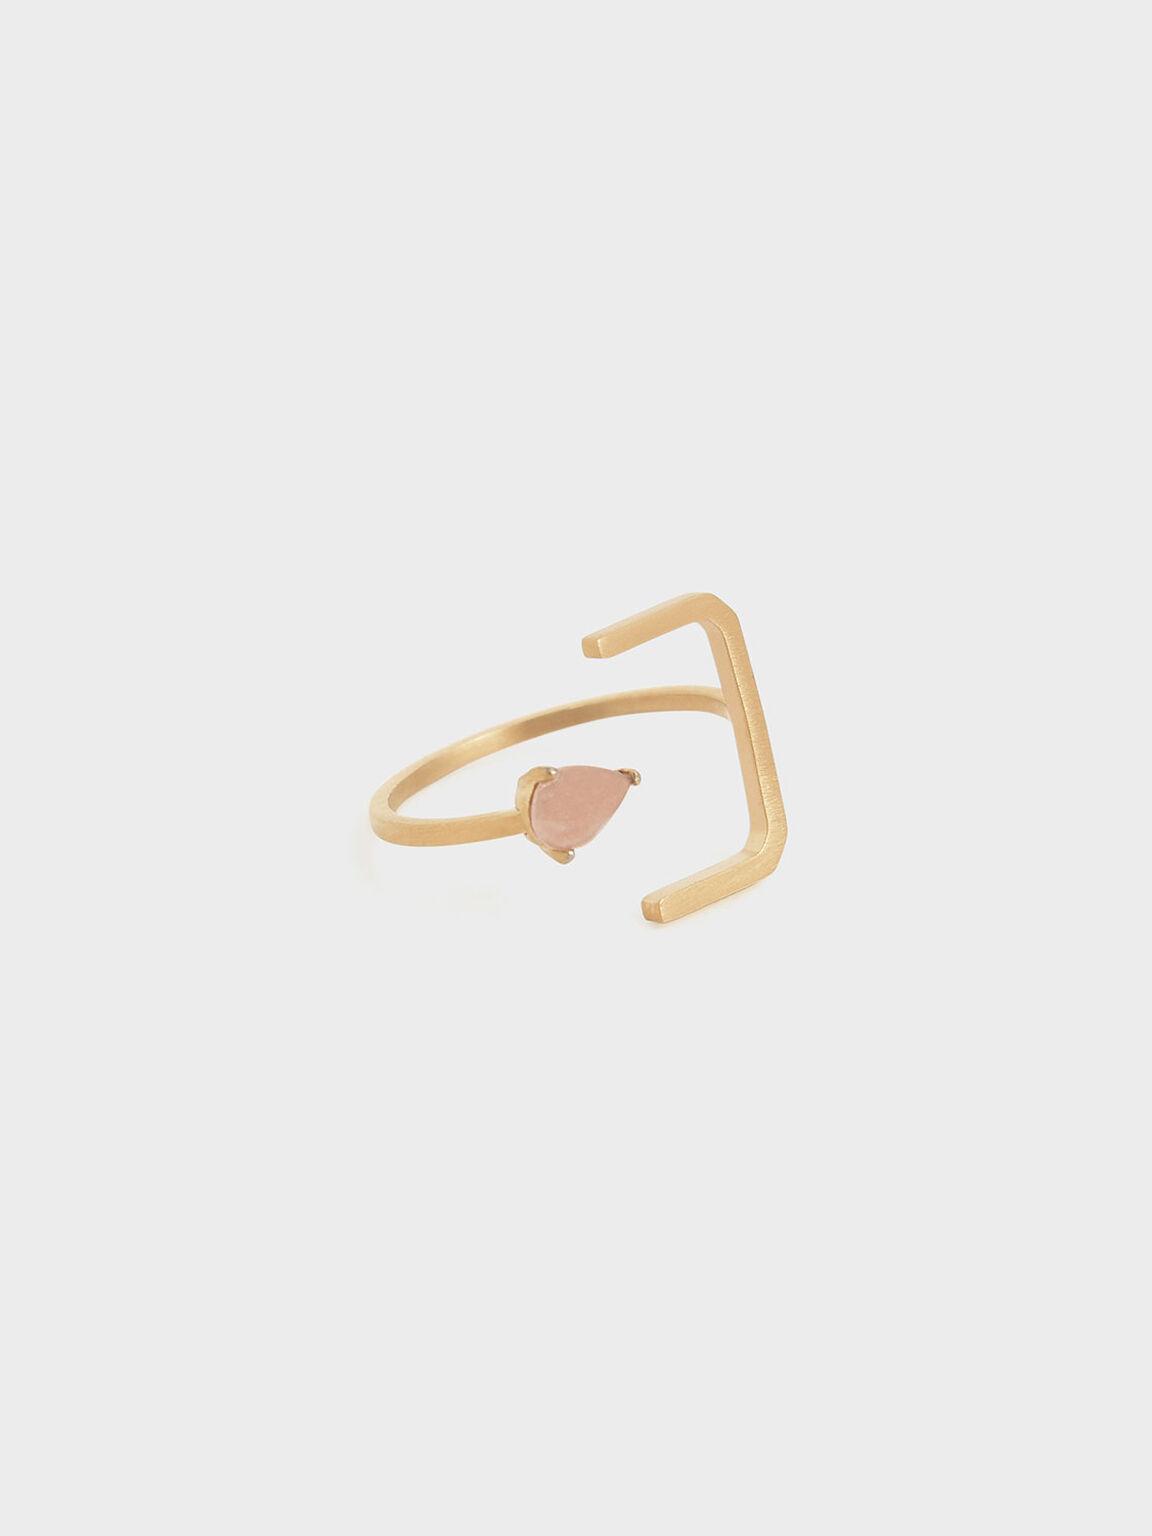 太陽石U型戒指, 青銅色, hi-res